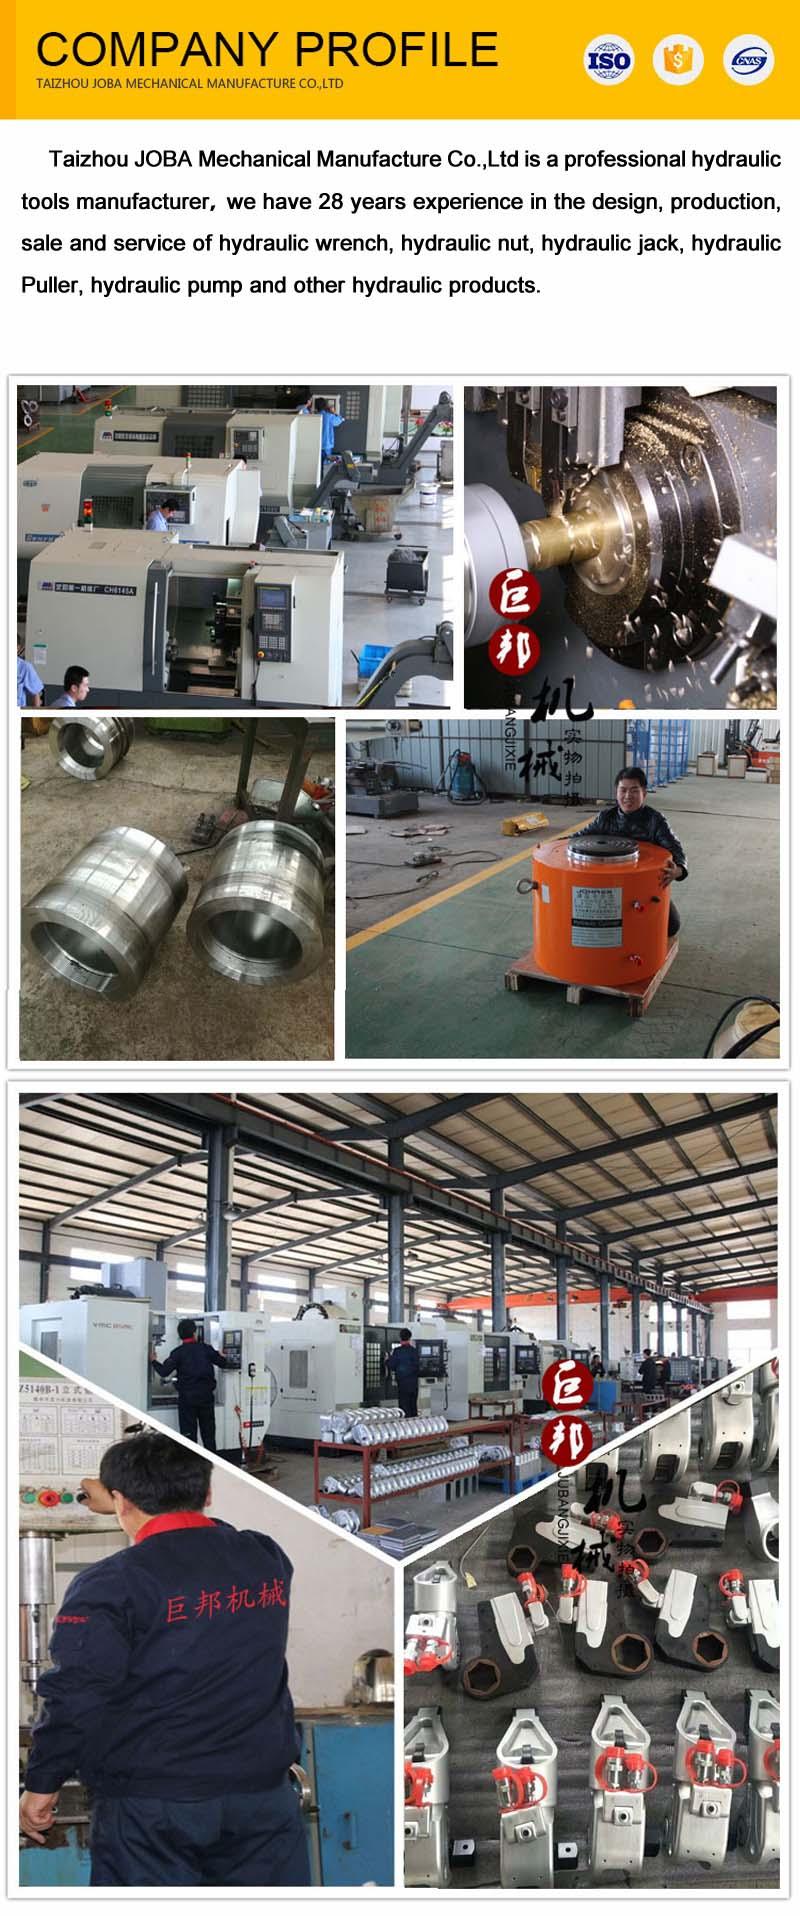 Kustom Produsen Excavator untuk Truk Tipper Truck Teleskopik Listrik 3 Tahap Plastik Lifting Jack Hidrolik Silinder